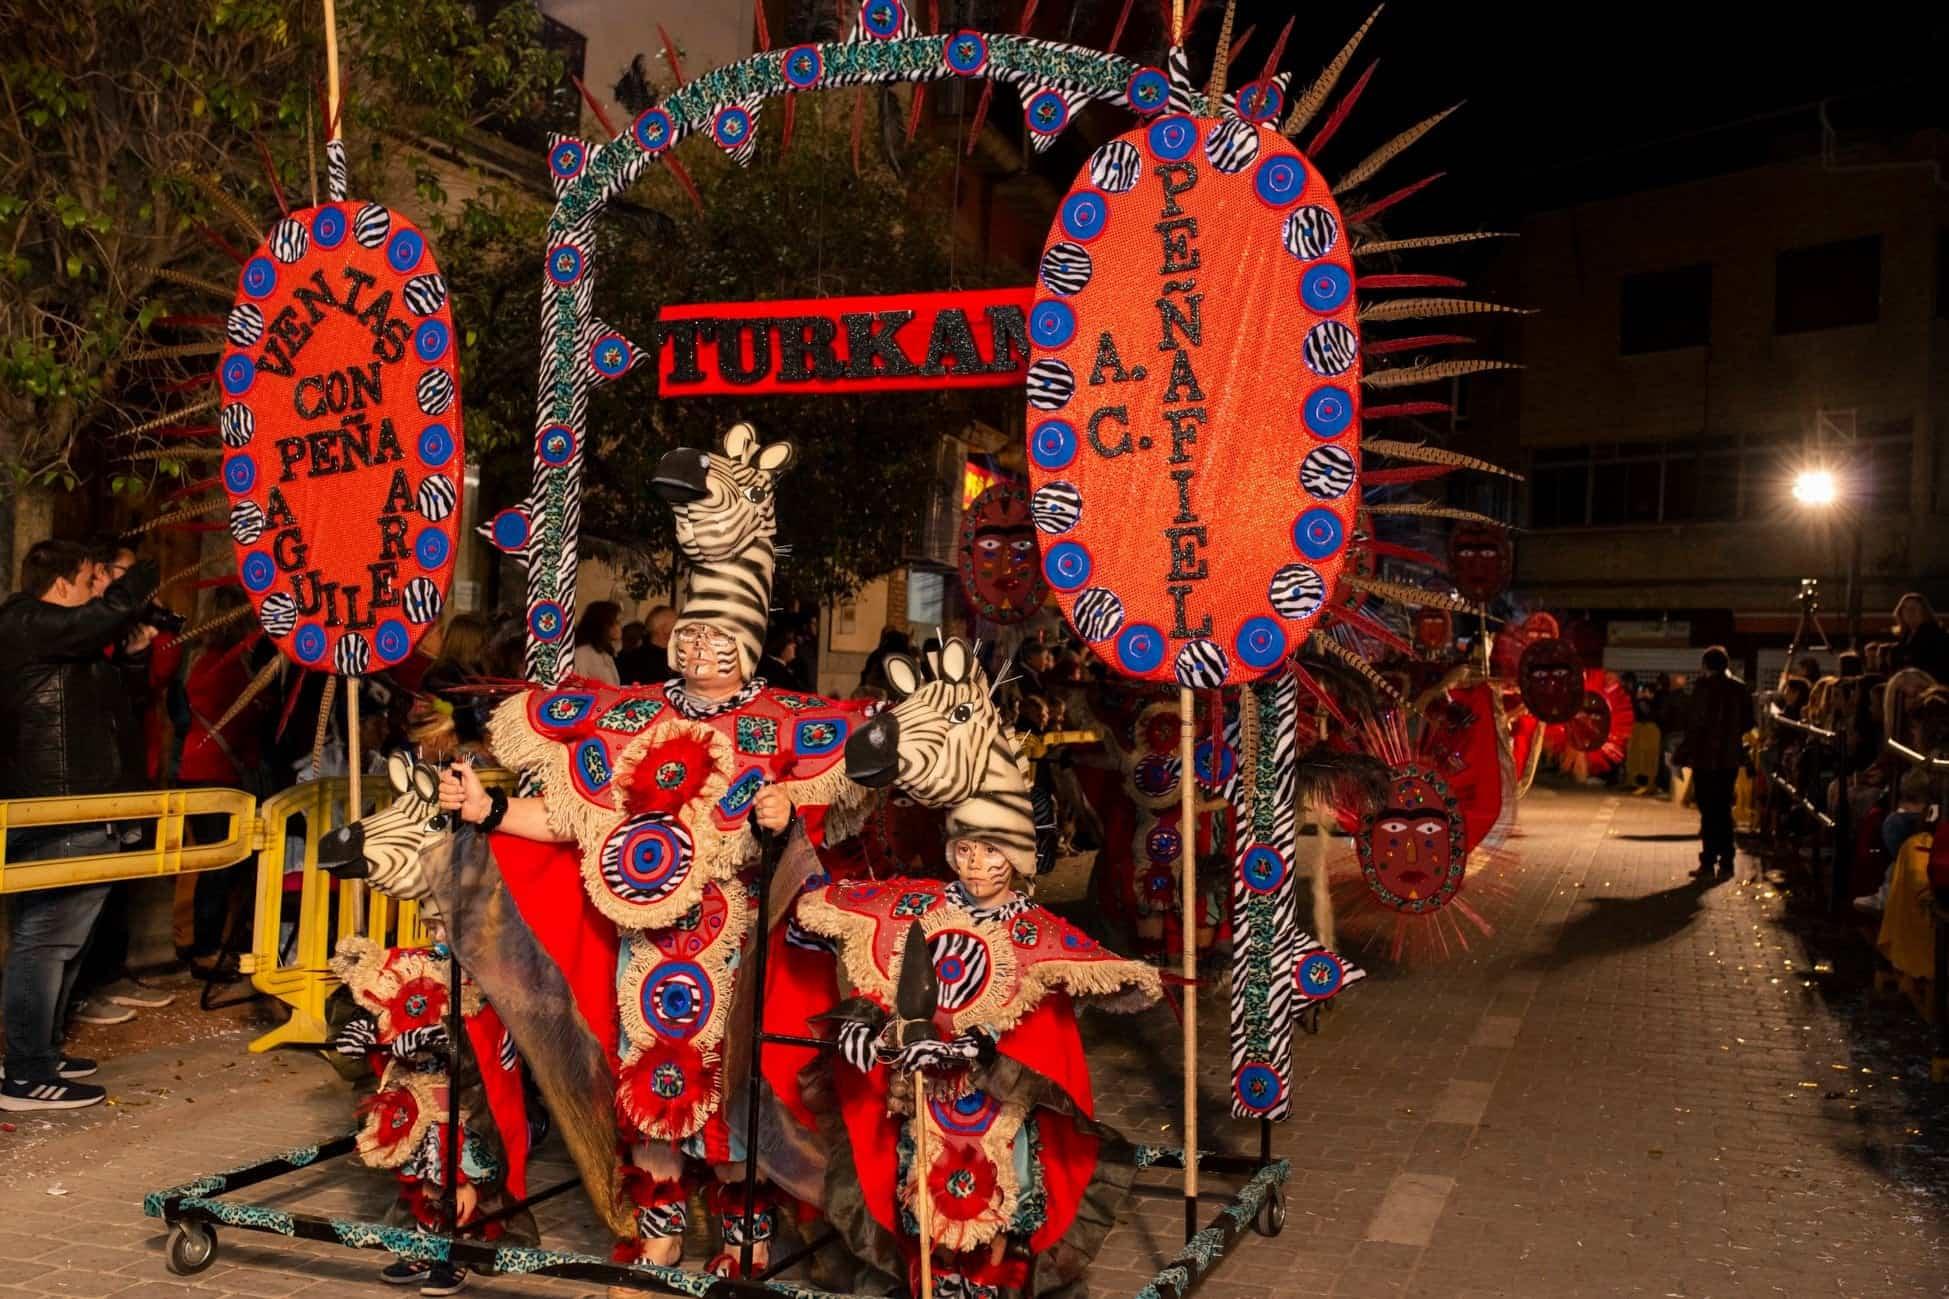 Carnaval de herencia 2020 ofertorio 110 - Selección de fotografías del Ofertorio del Carnaval de Herencia